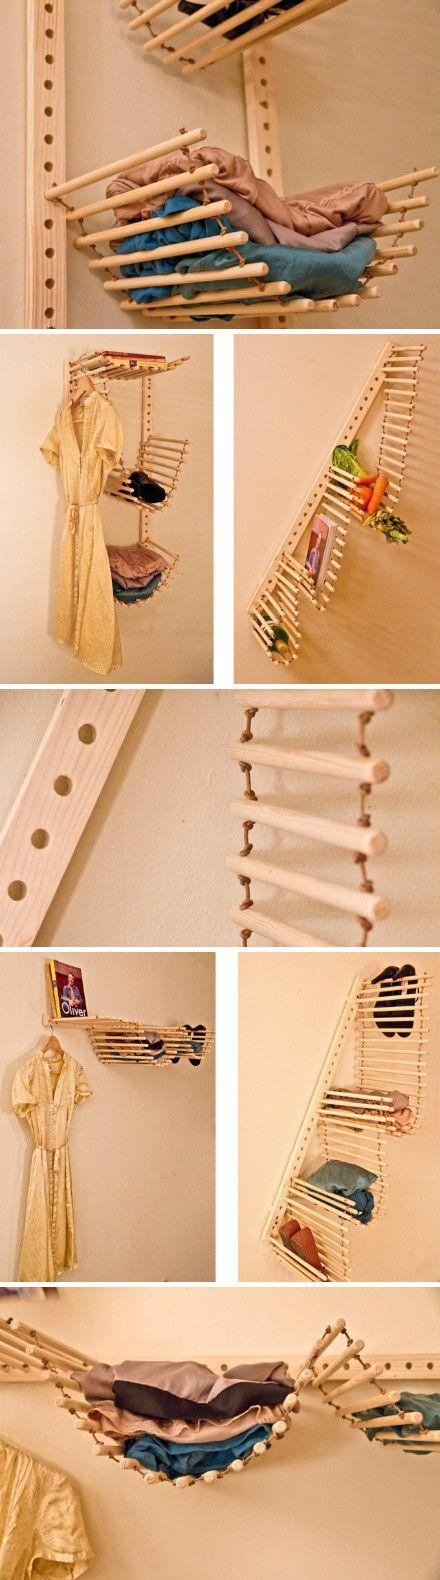 Flexible wood organizer